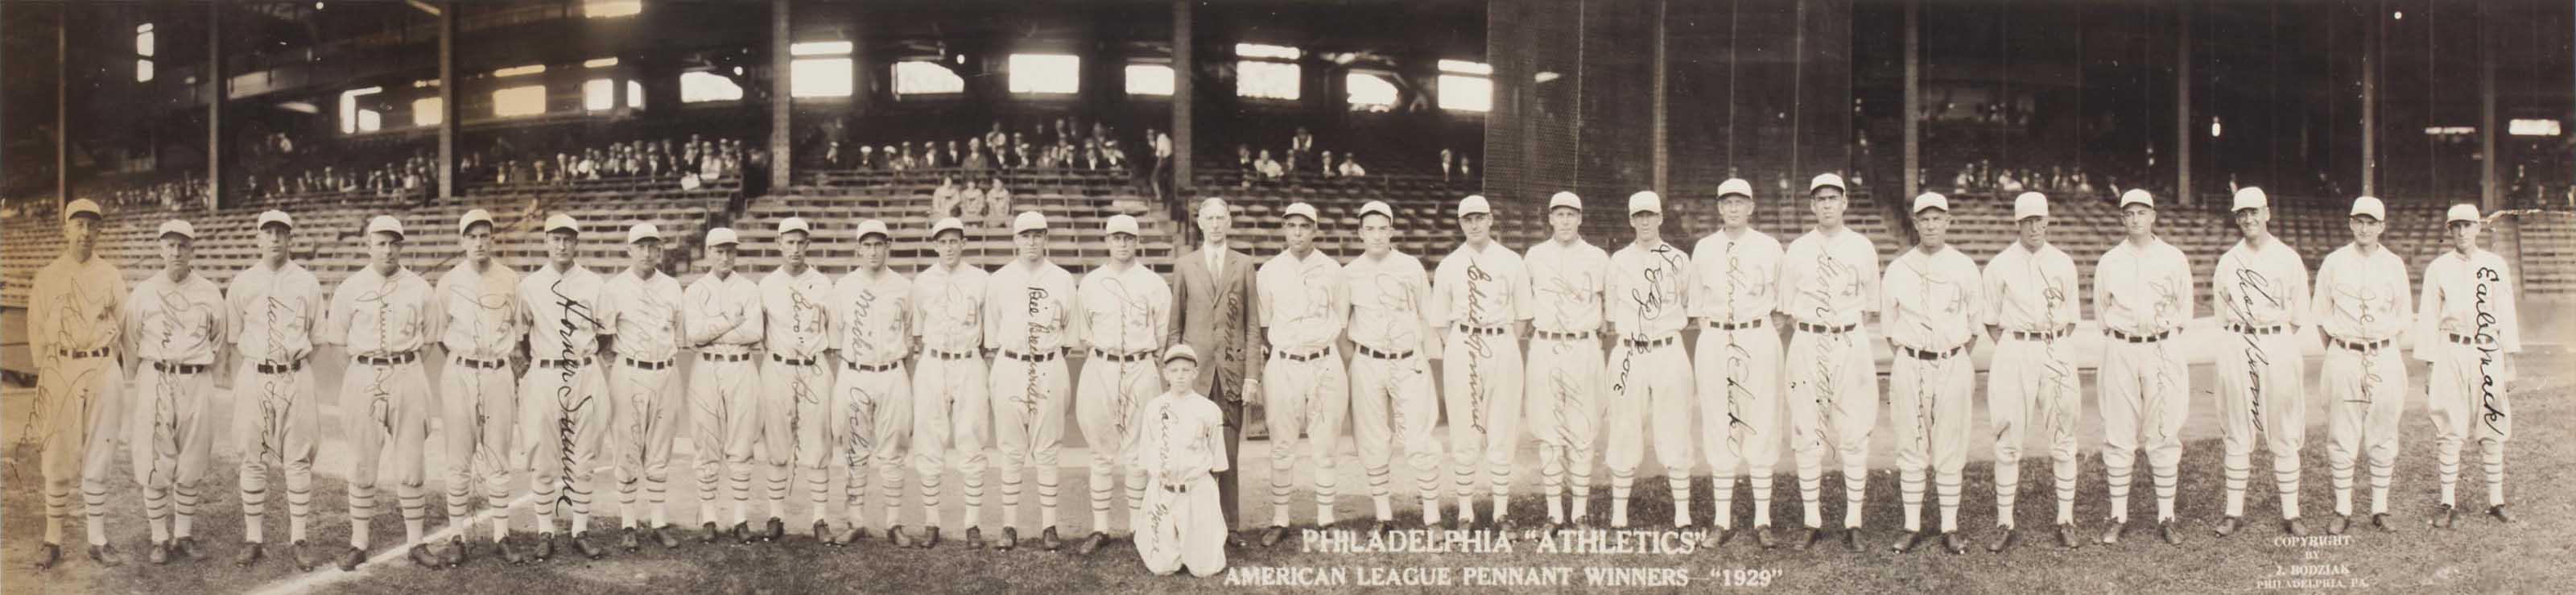 1929 PHILADELPHIA ATHLETICS SI